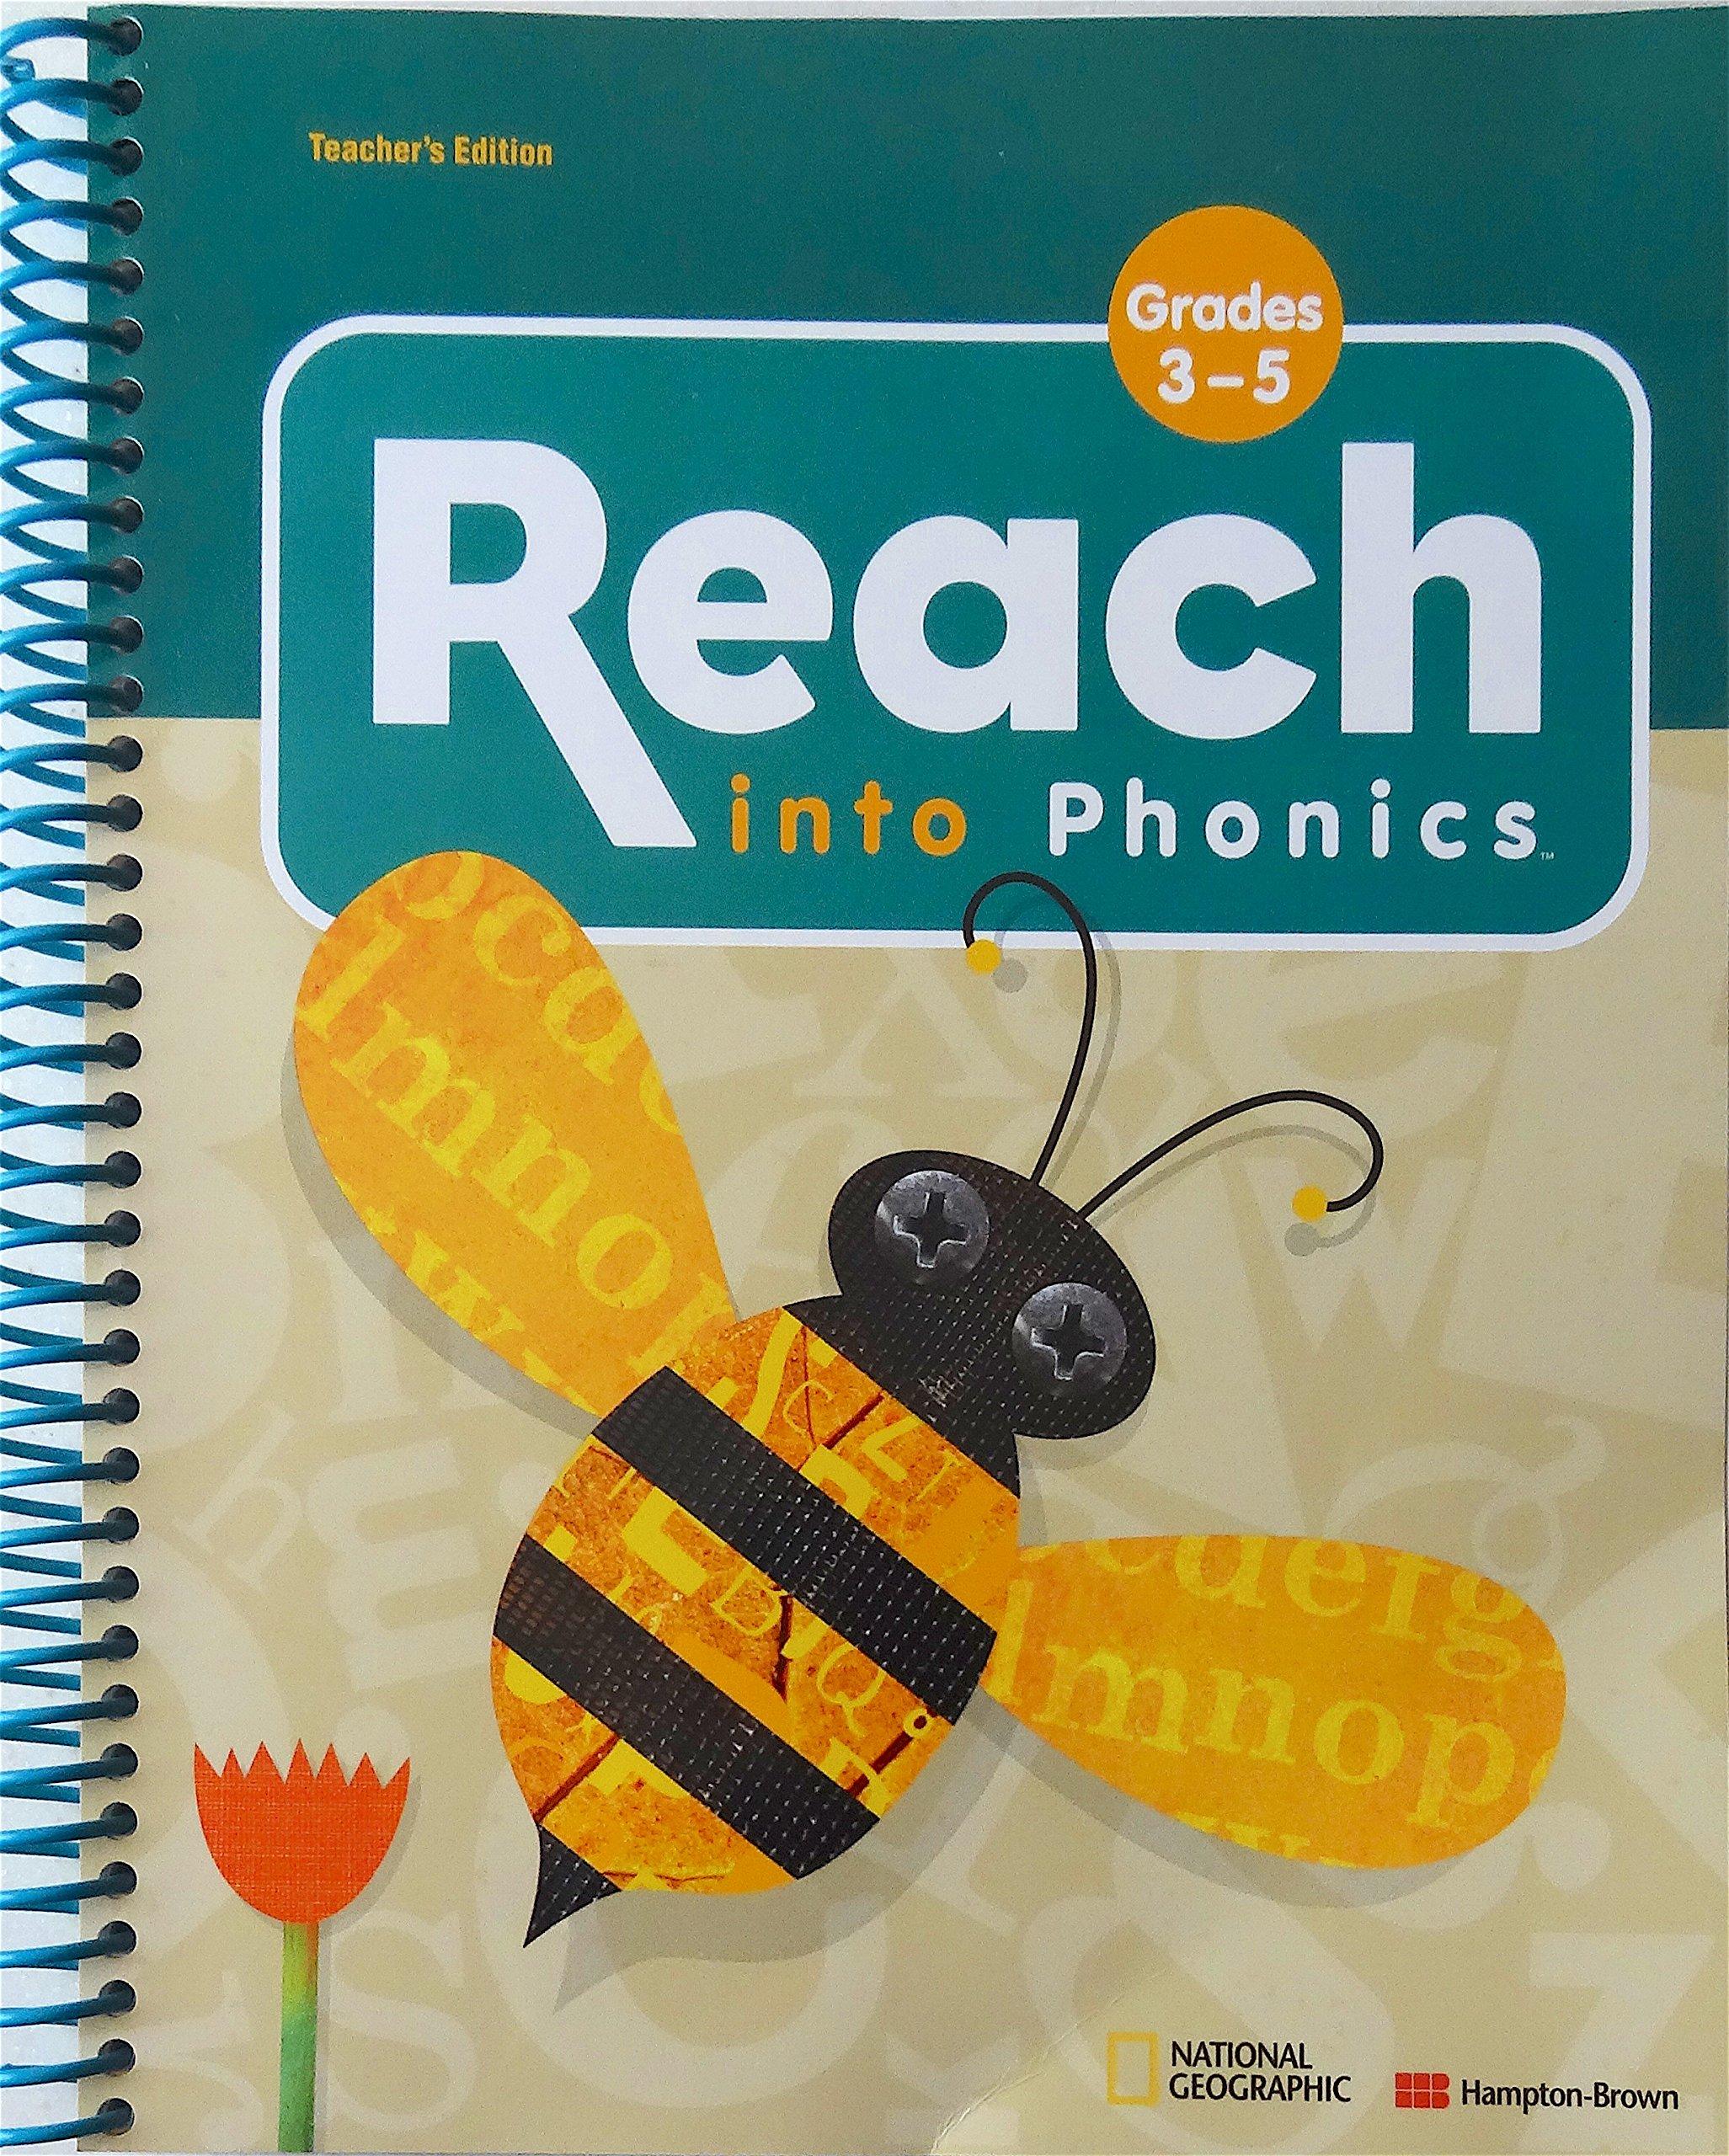 Download Reach Into Phonics w/ 2 Sounds & Songs Cds ~ Grades 3-5 (Teacher's Edition) pdf